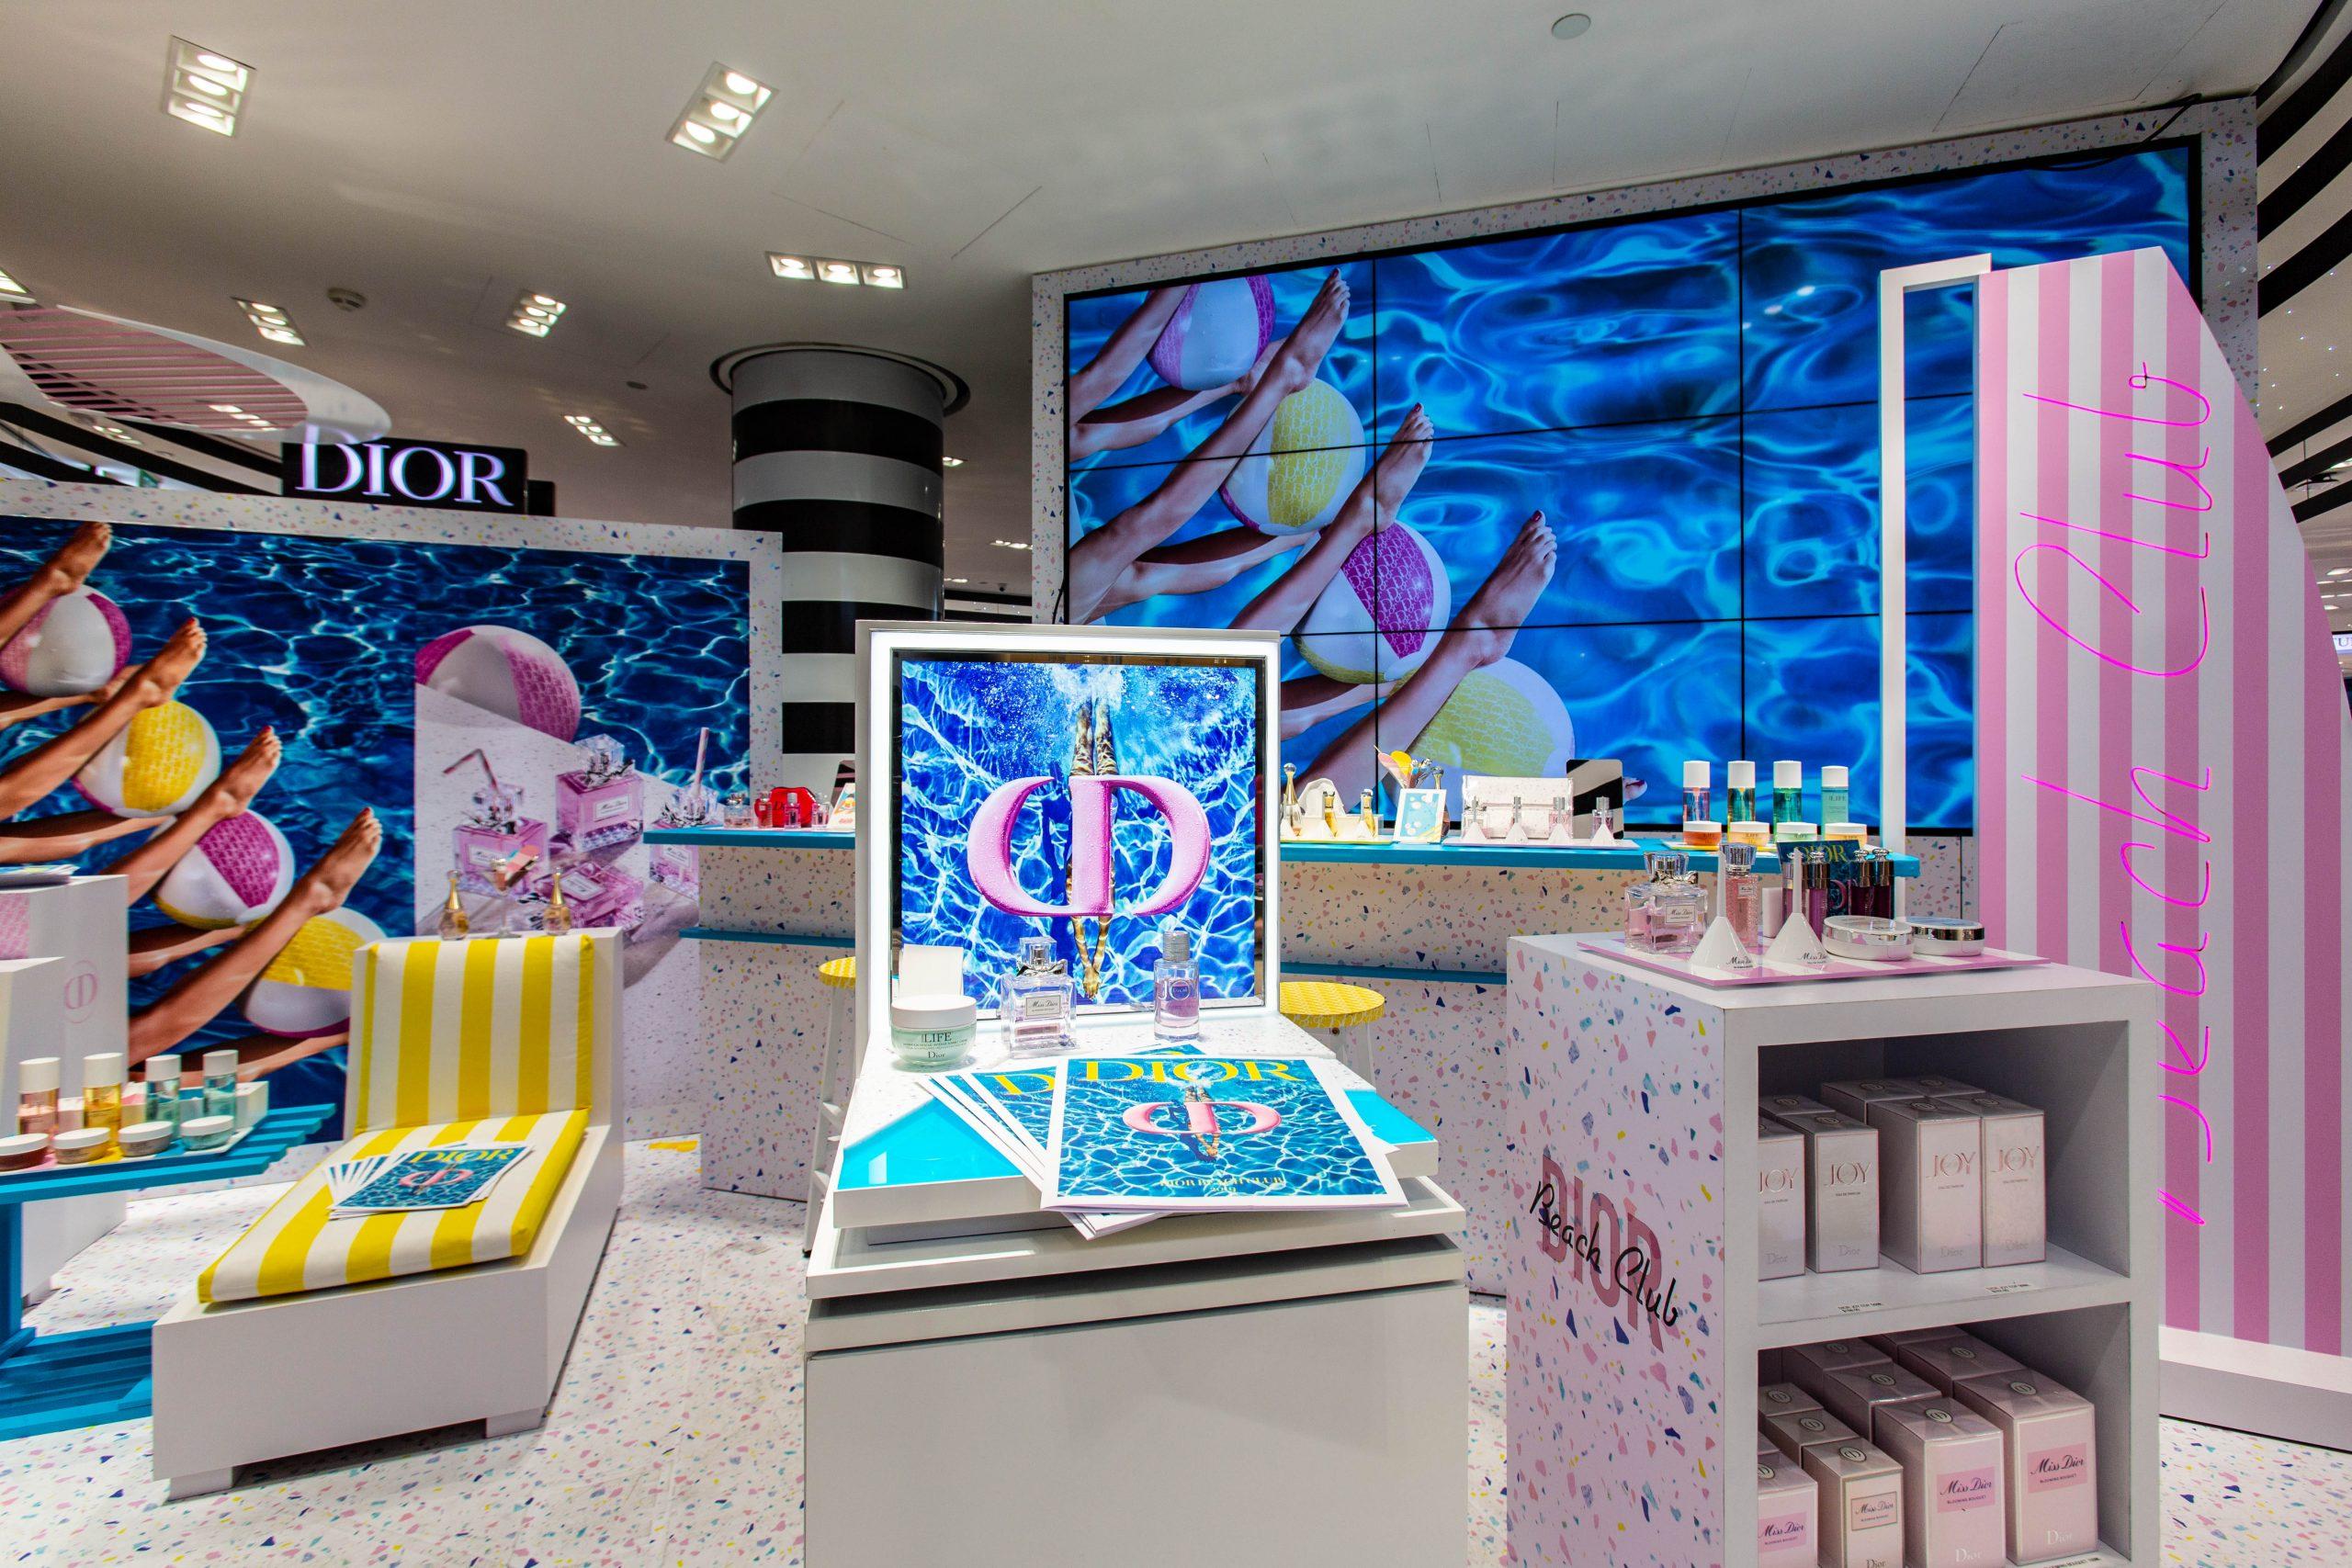 Dior Beach Club Brand Activation